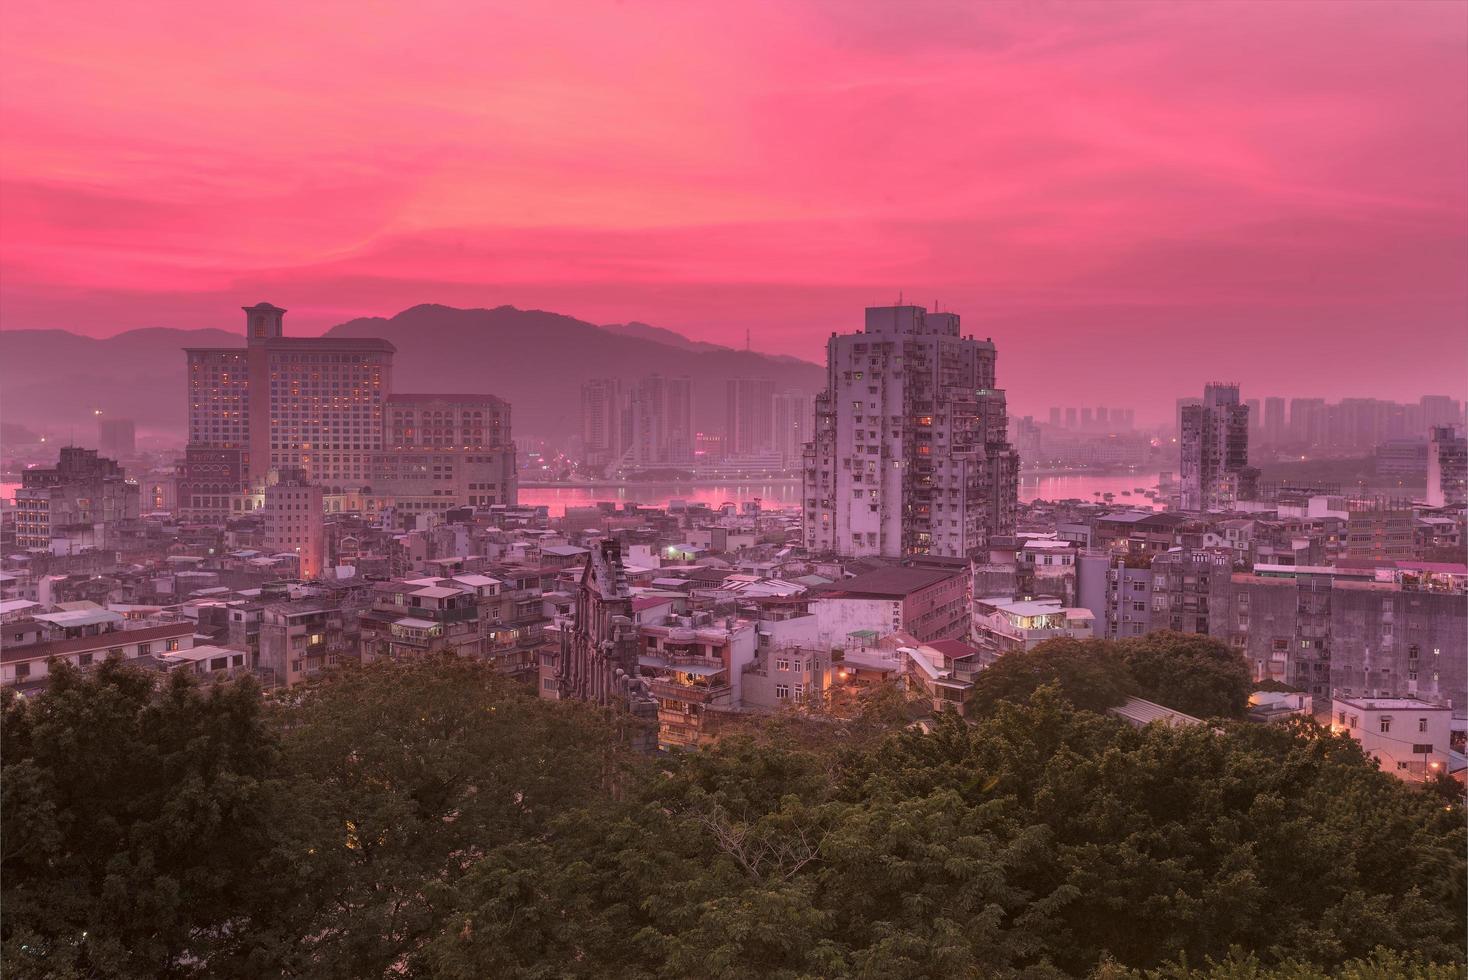 Macau centrum in de schemering foto